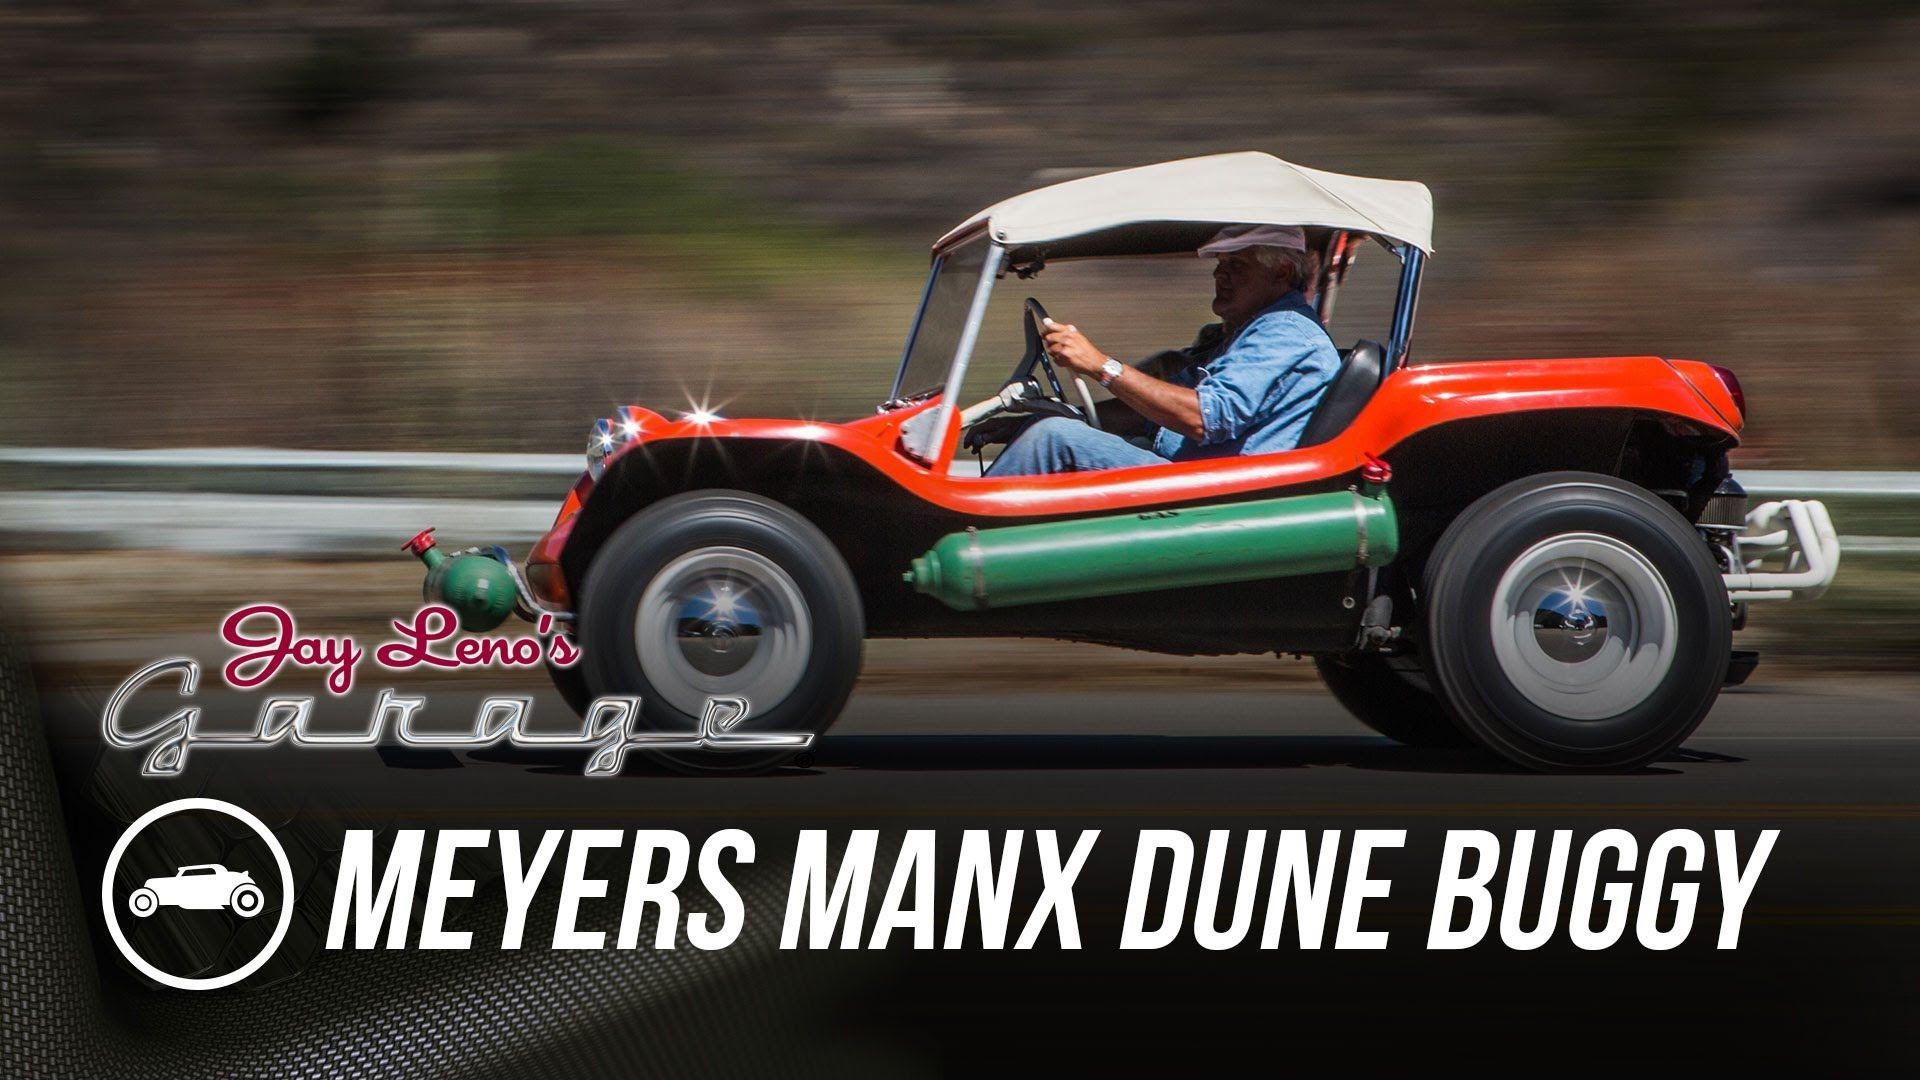 Meyers Manx Dune Buggy Jay Leno S Garage Dune Buggy Manx Dune Buggy Manx